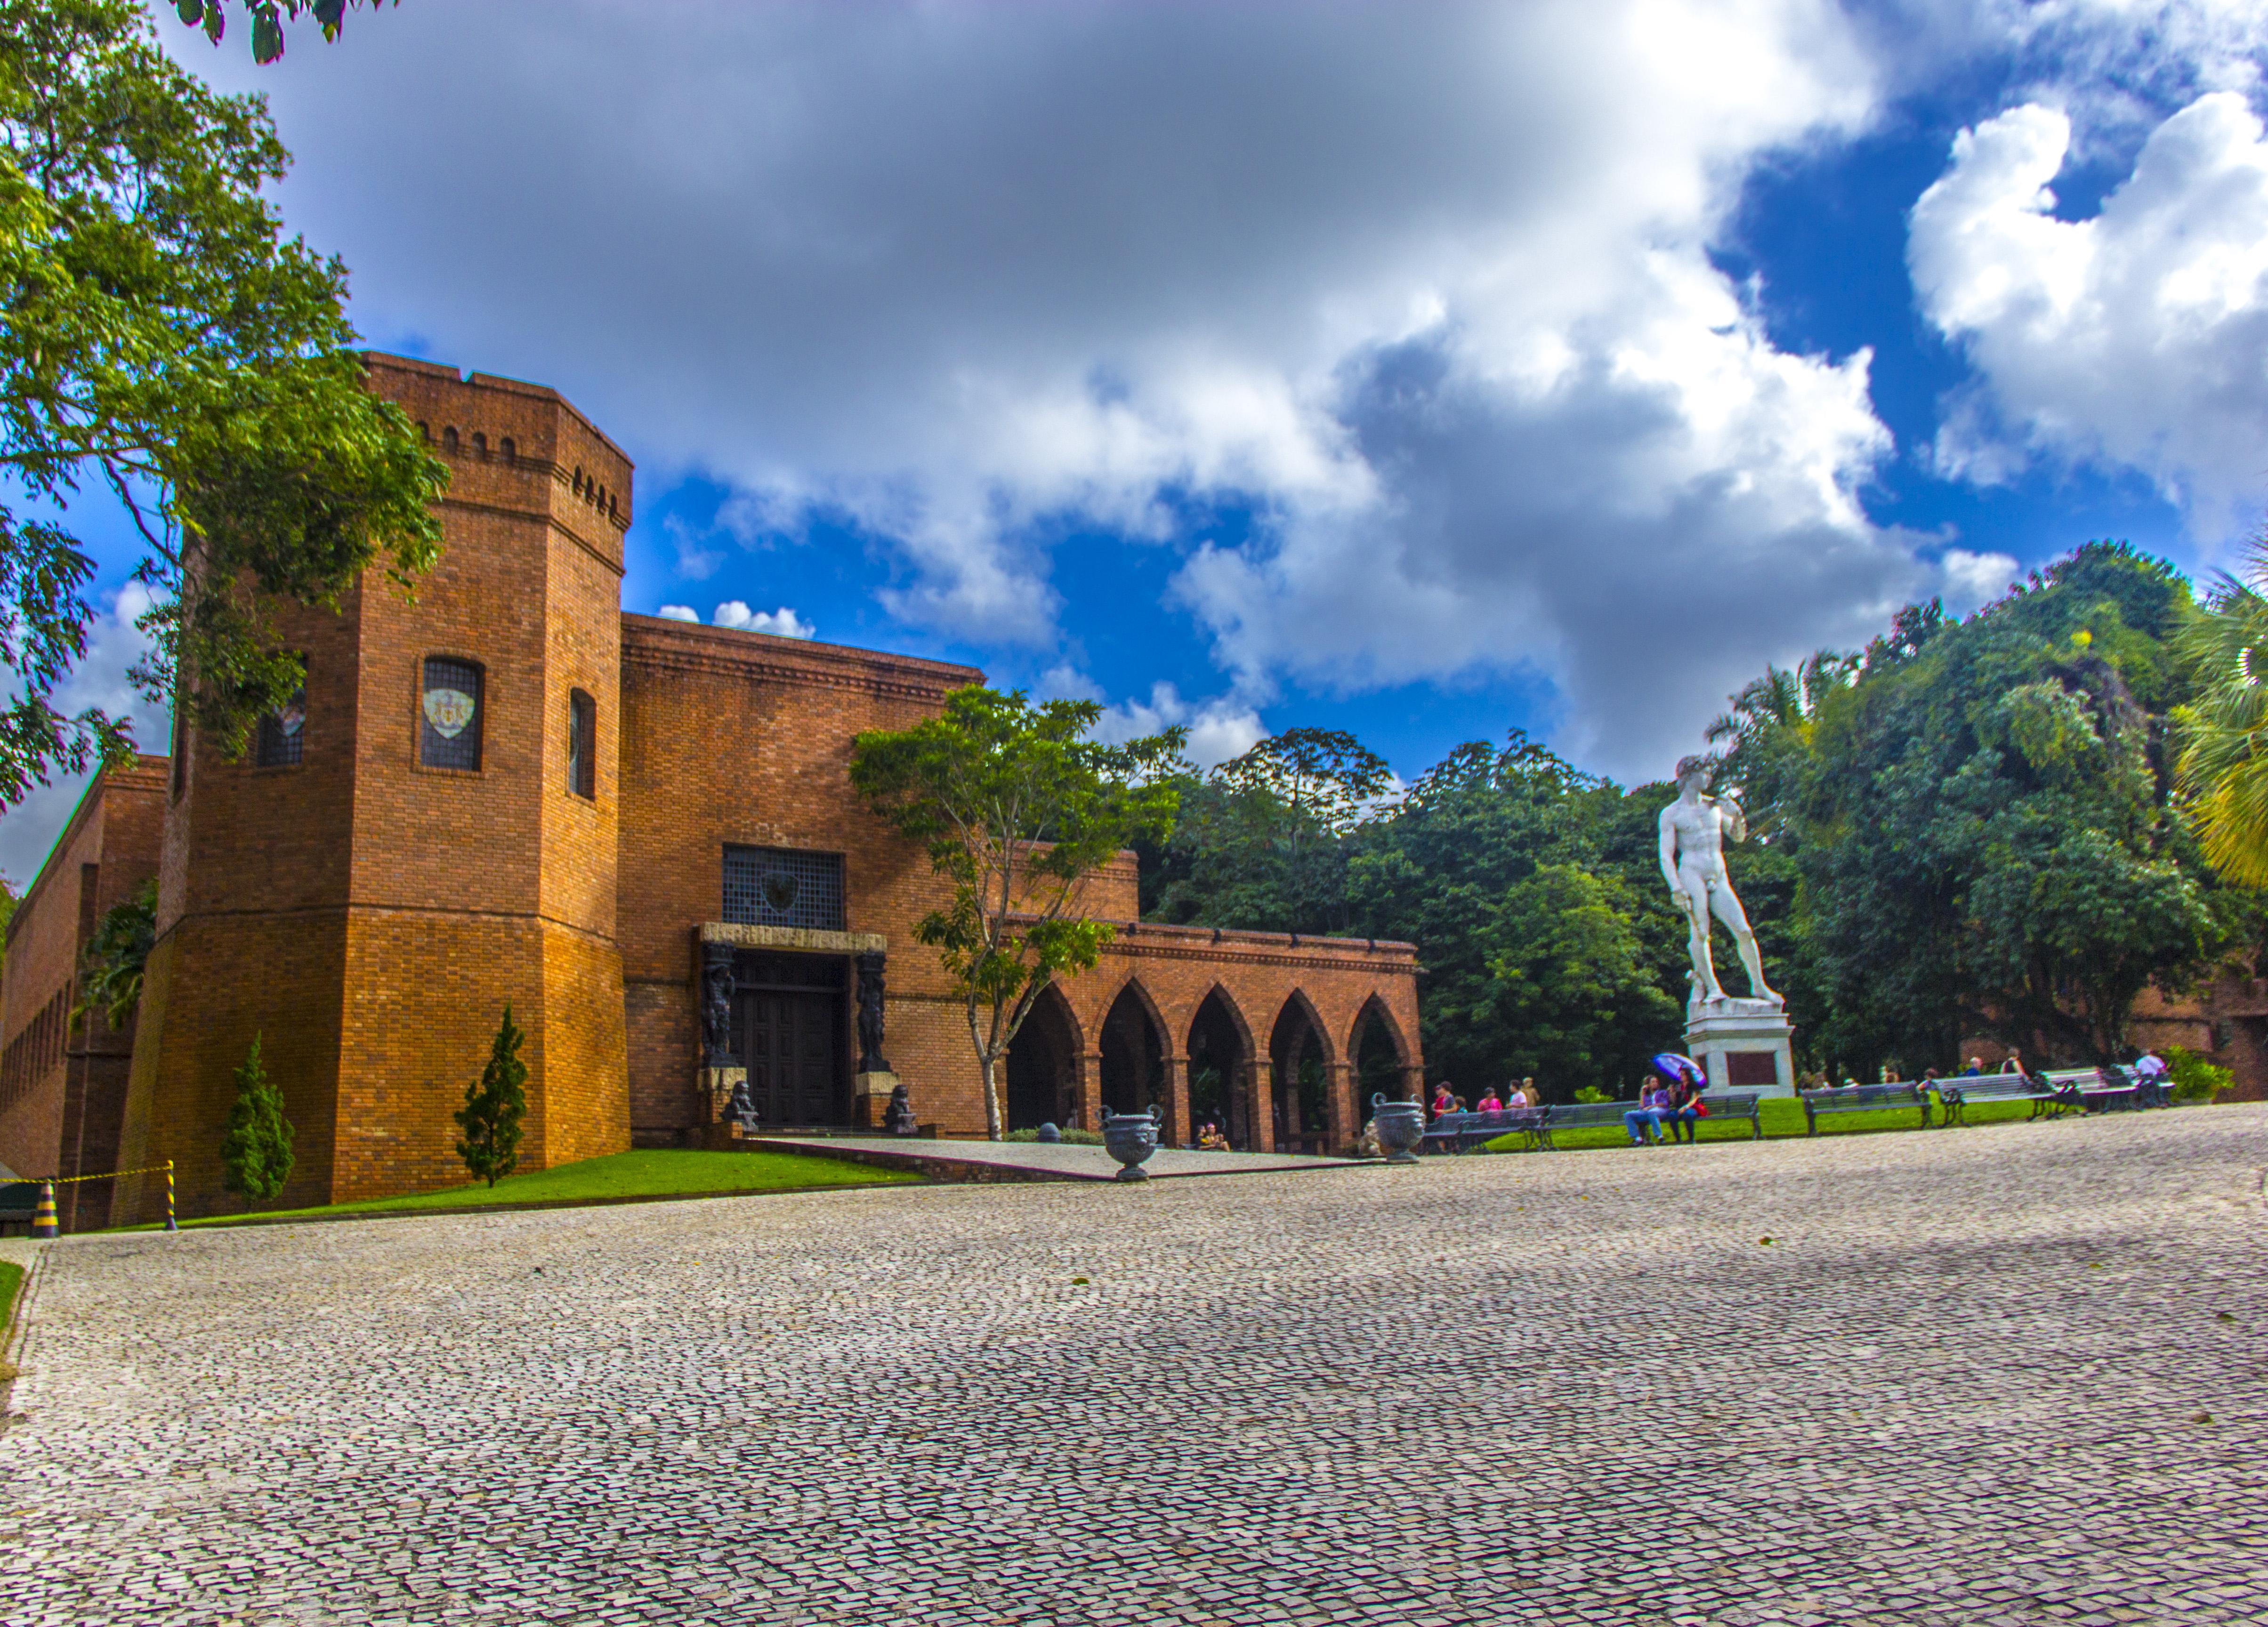 Castelo do Instituto Ricardo Brennand, Recife, Pernambuco